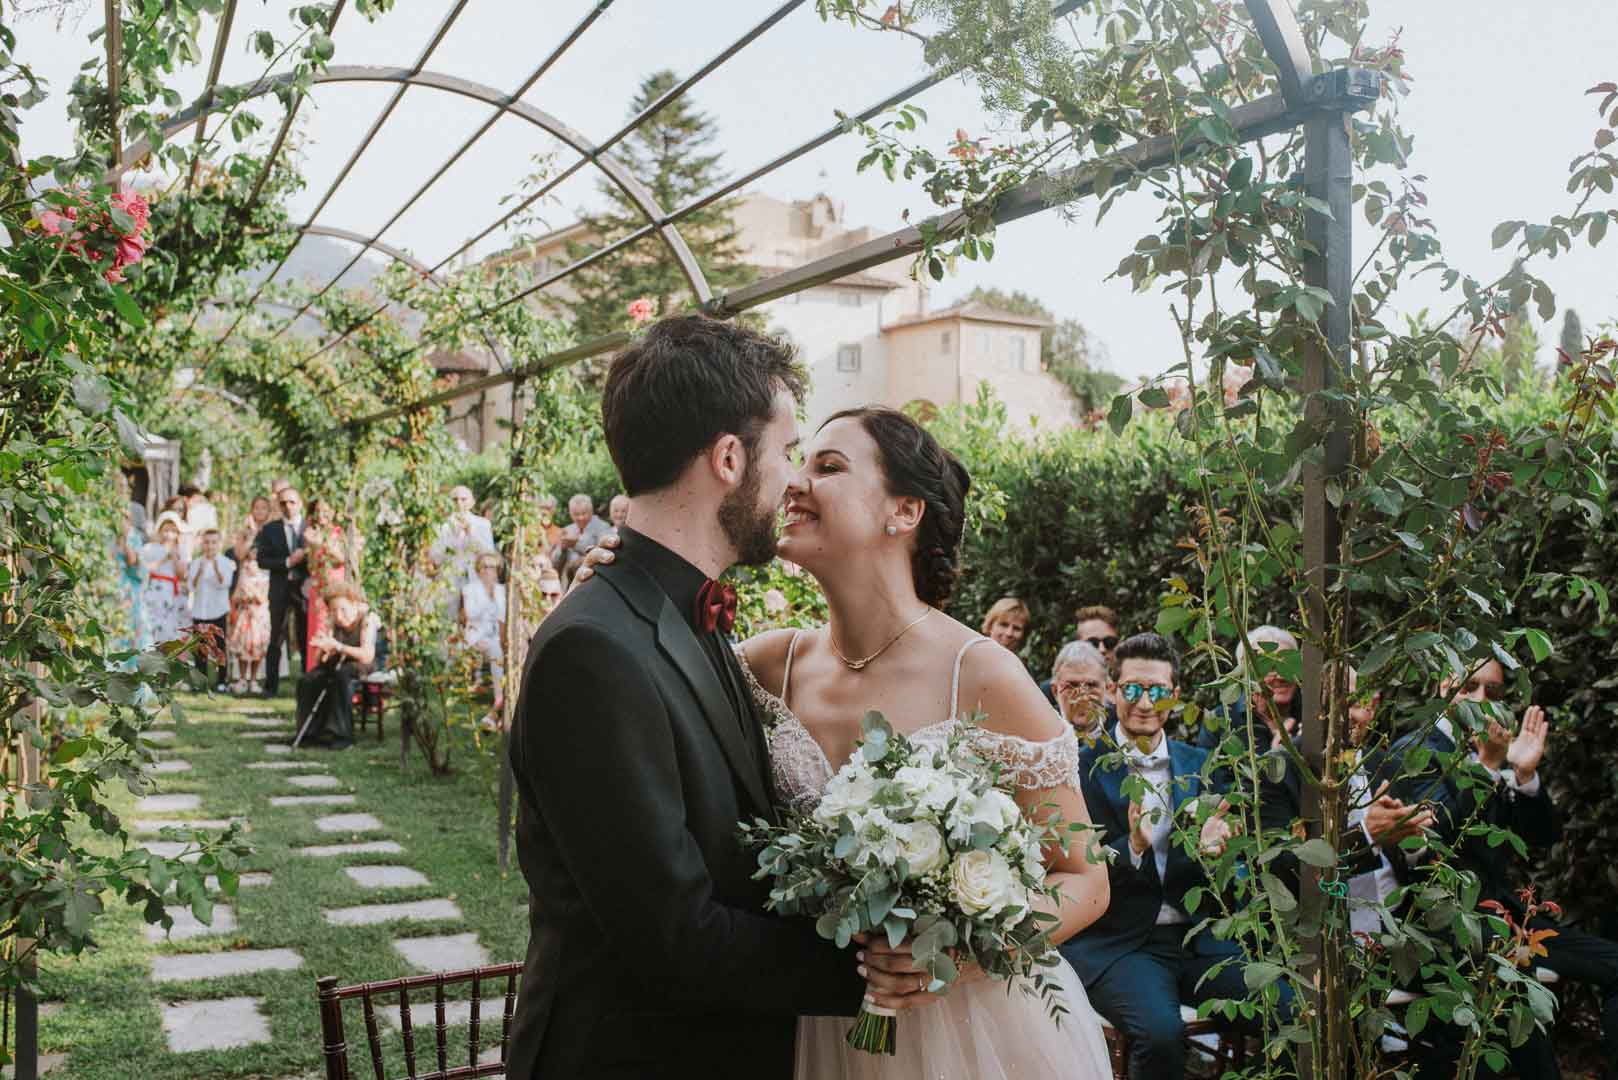 wedding-photographer-destination-fineart-bespoke-reportage-tuscany-villascorzi-vivianeizzo-spazio46-78